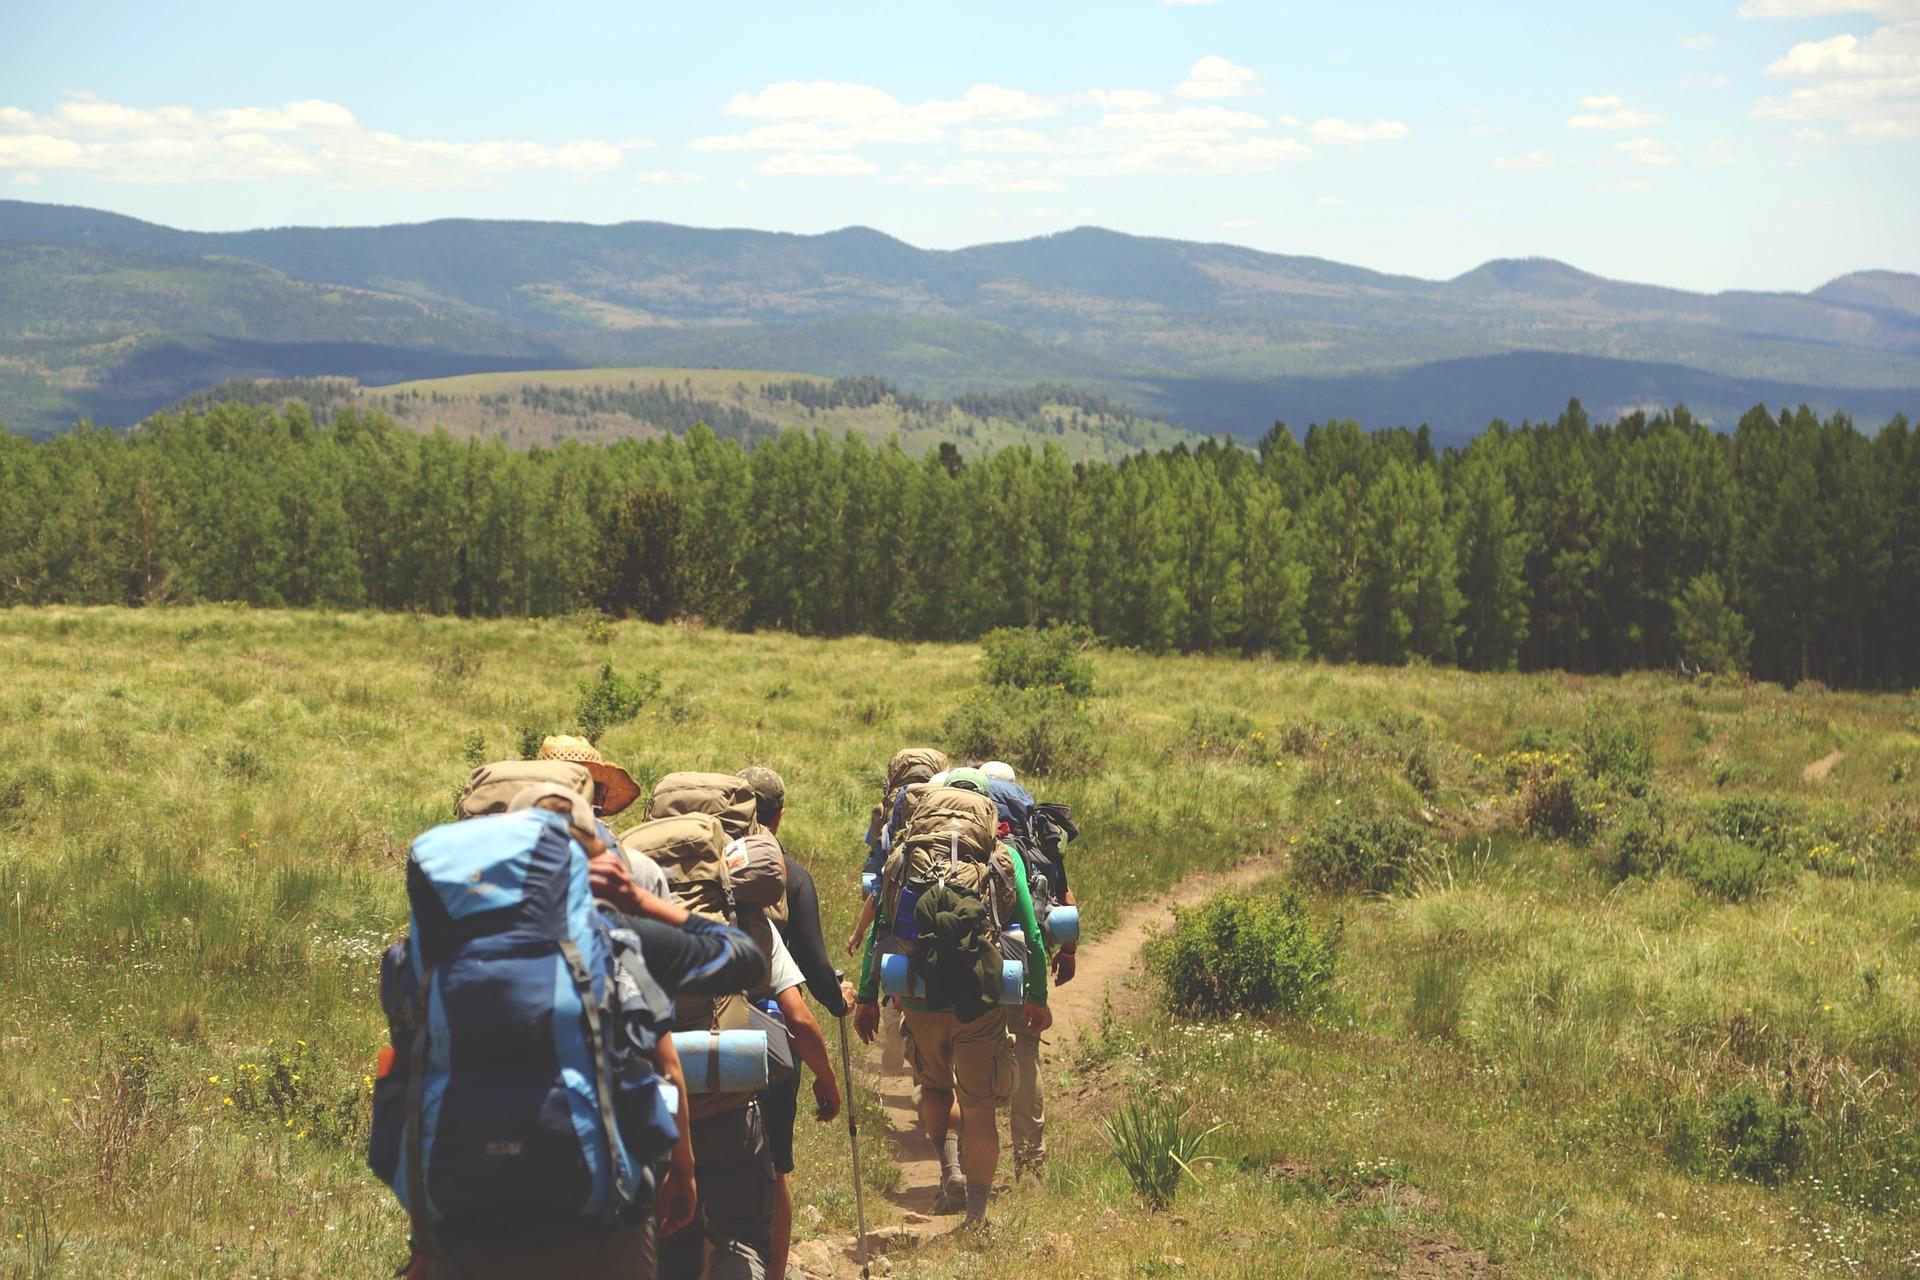 Equipamentos para acampar: trekkers